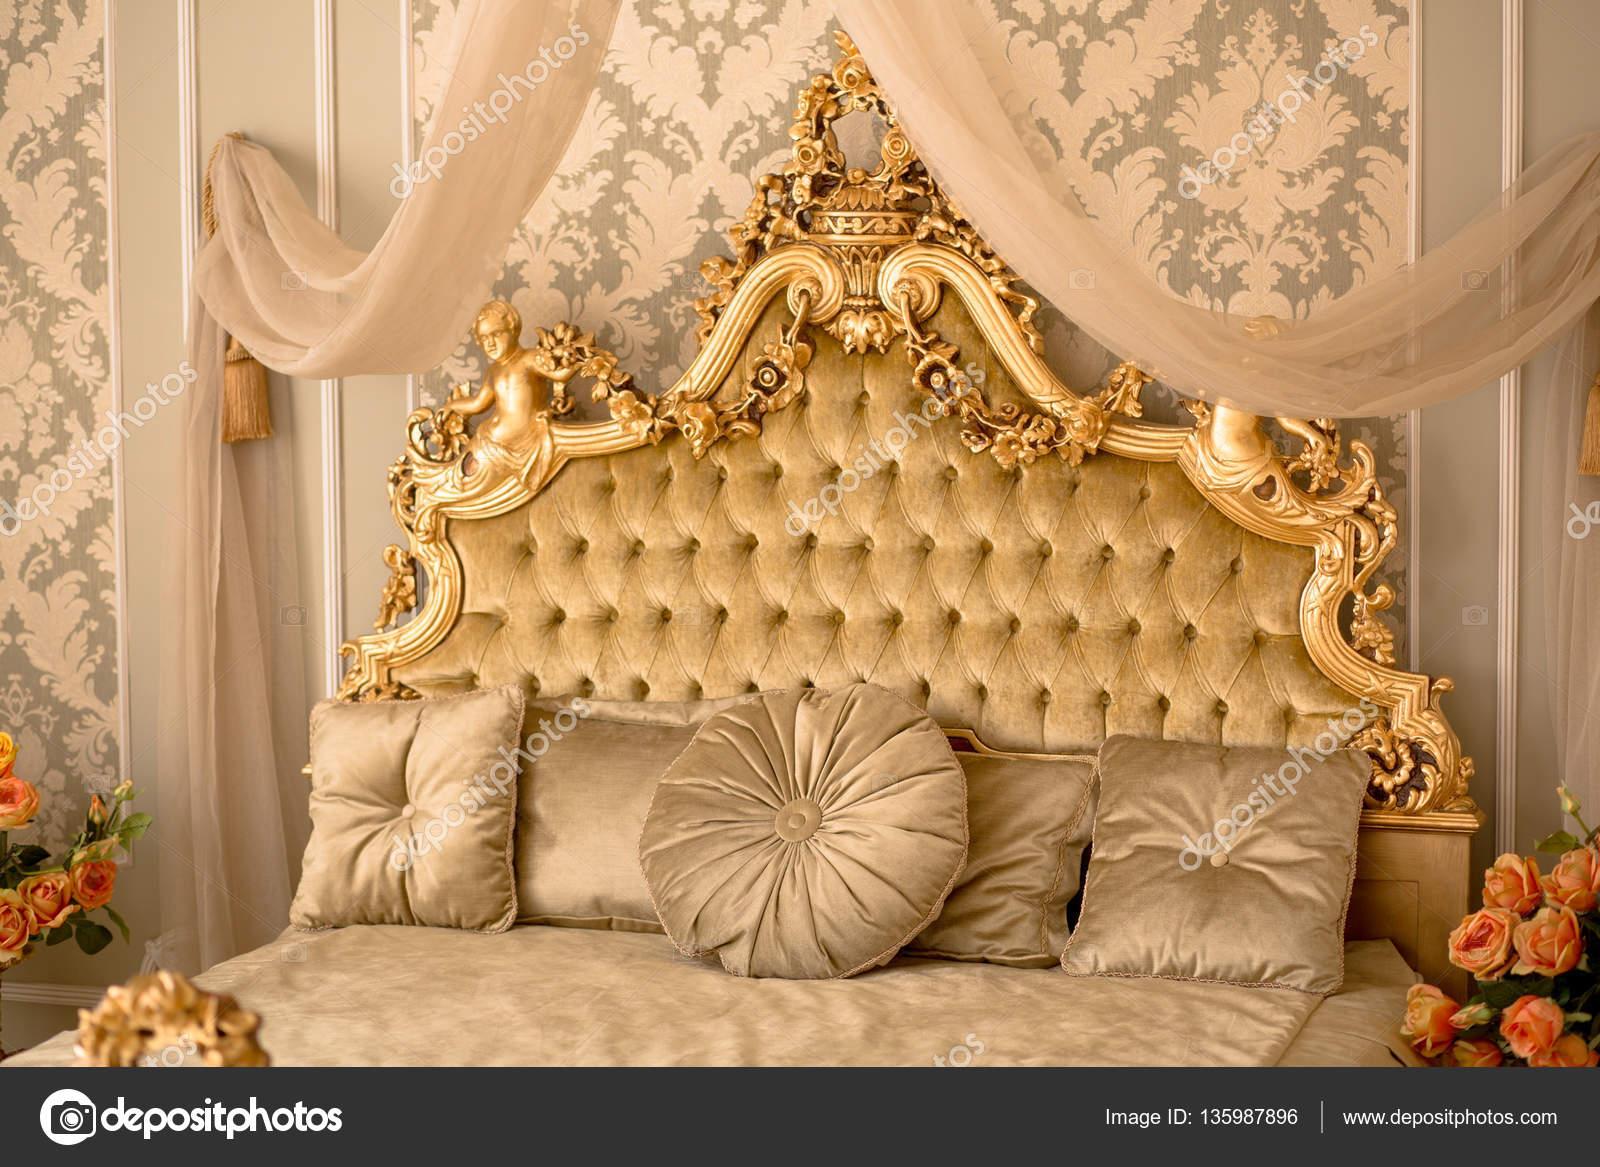 Koninklijke slaapkamer interieur — Stockfoto © svyatoslavlipik ...